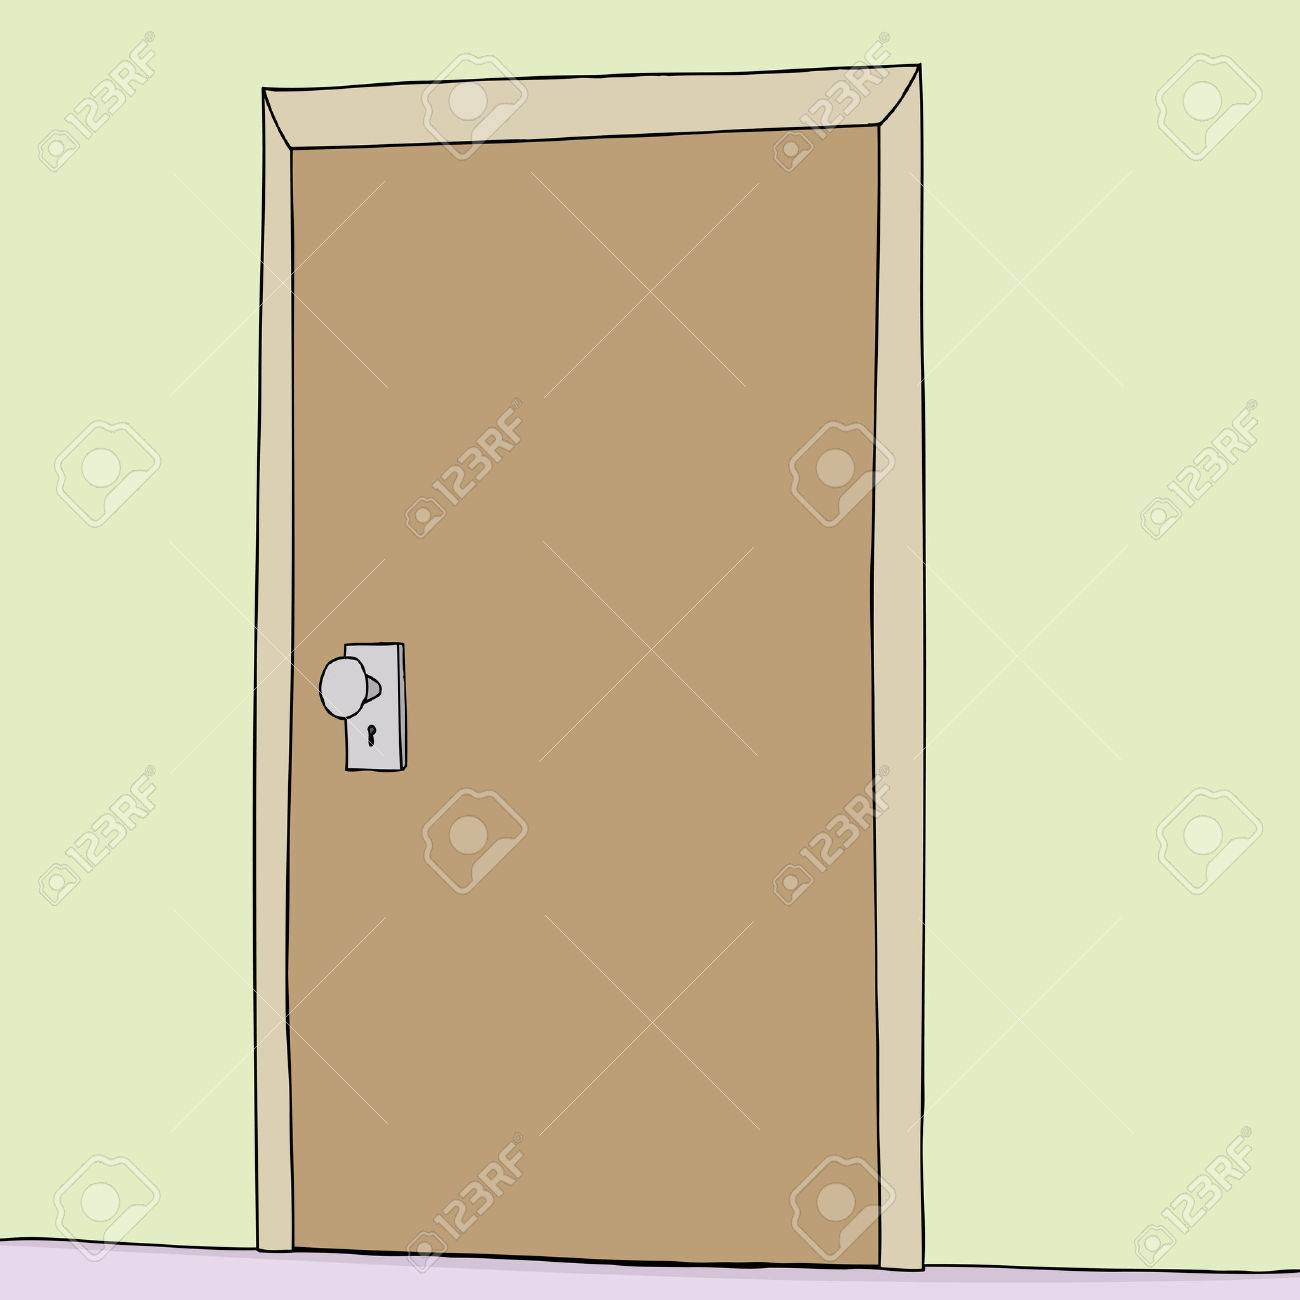 Single hand drawn shut door in green wall Stock Vector - 33573262 & Single Hand Drawn Shut Door In Green Wall Royalty Free Cliparts ...